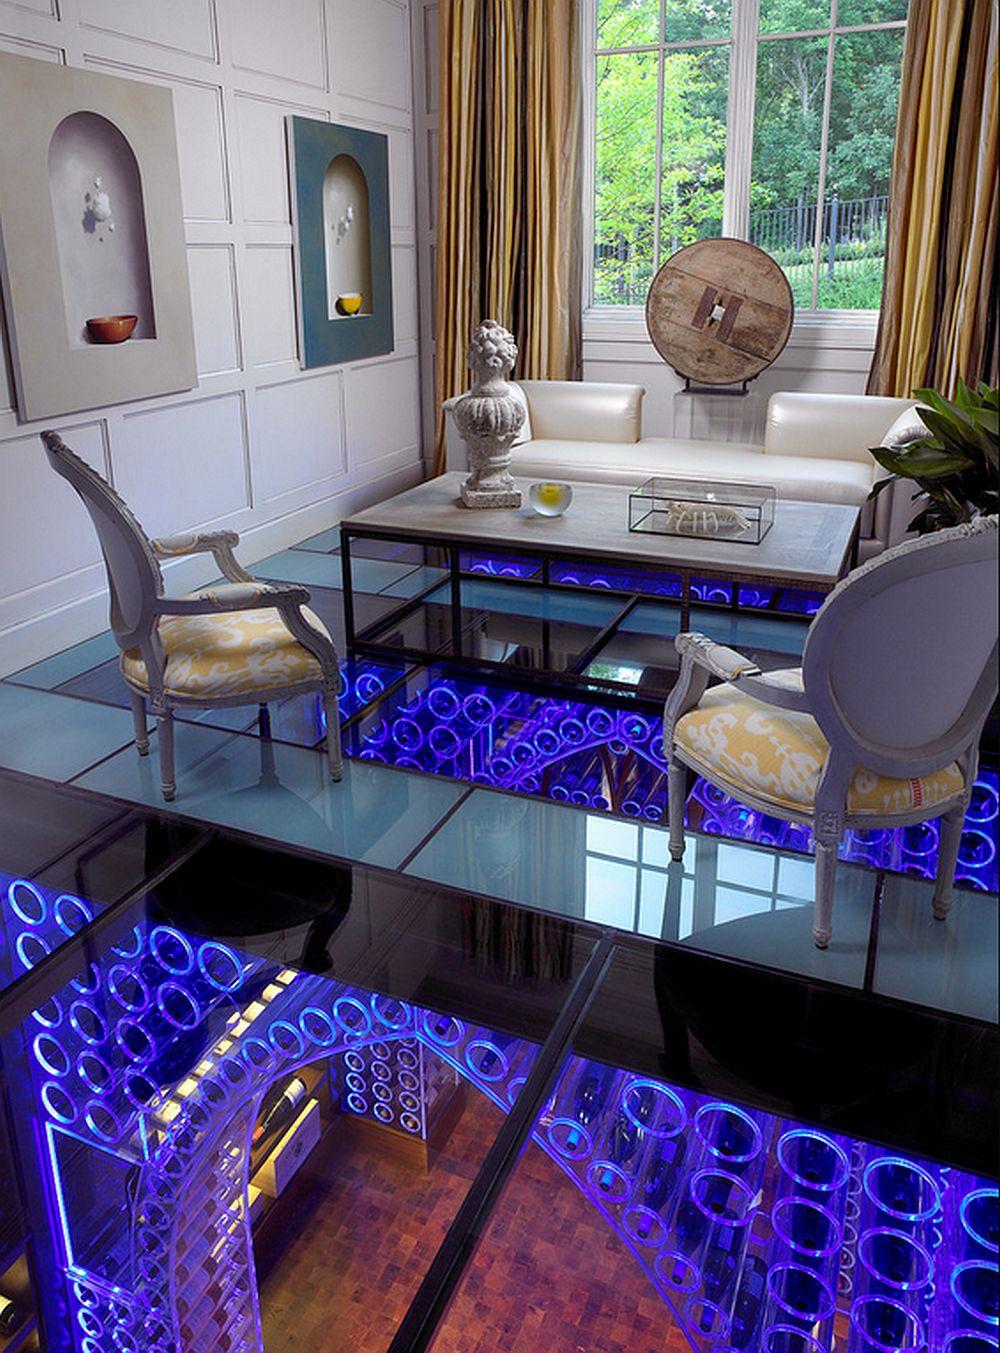 adelaparvu.com despre crama cu mobila transparenta si iluminat LED, design interior Beckwith Interiors Foto Kim Sargent (4)